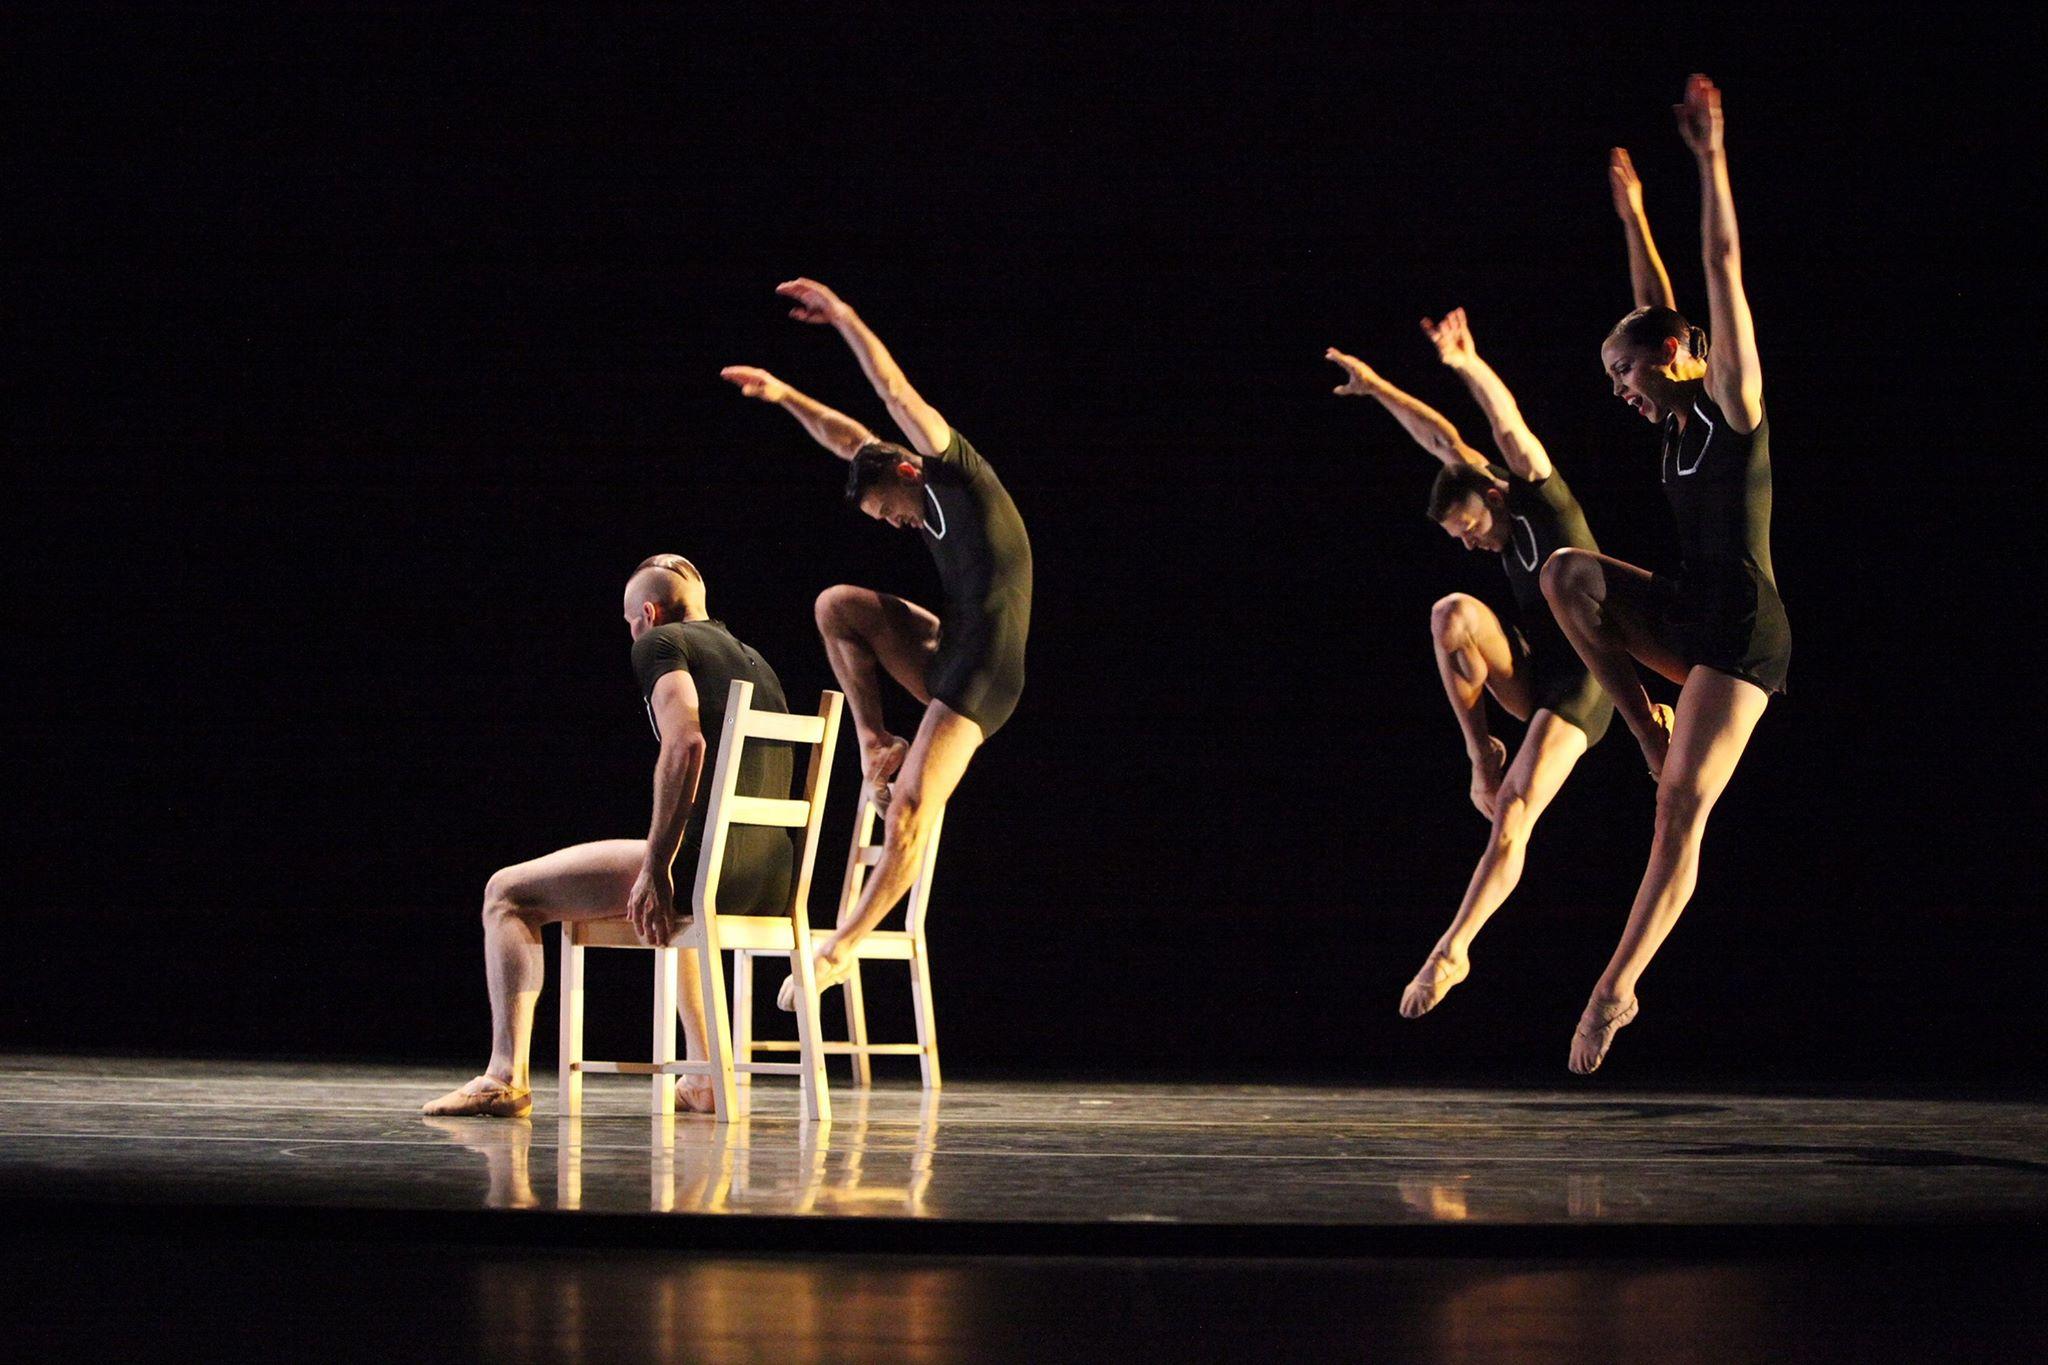 (c) Giordano Dance Chicago